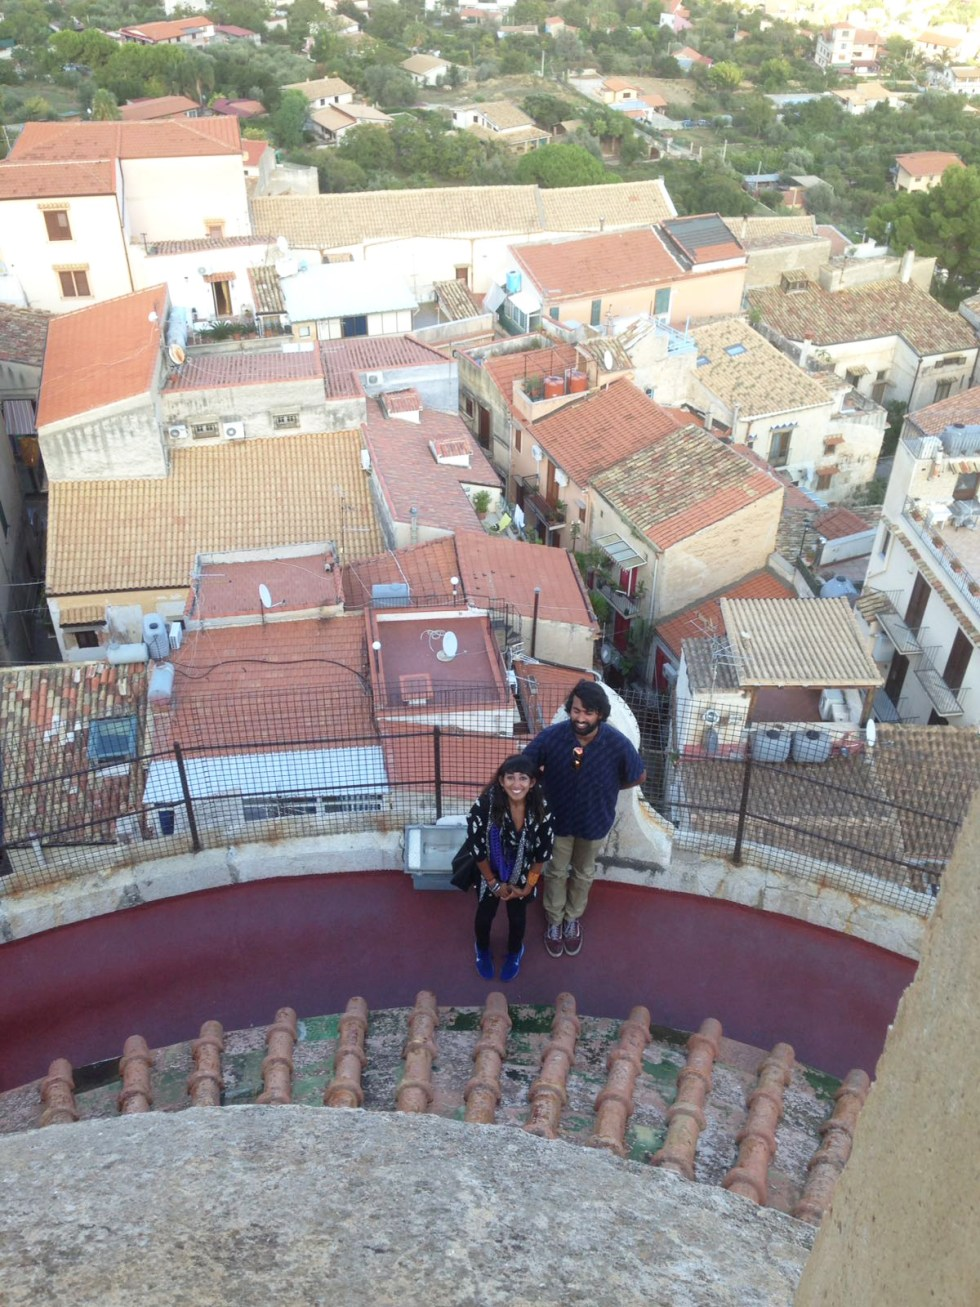 Monreale Palermo Sicily